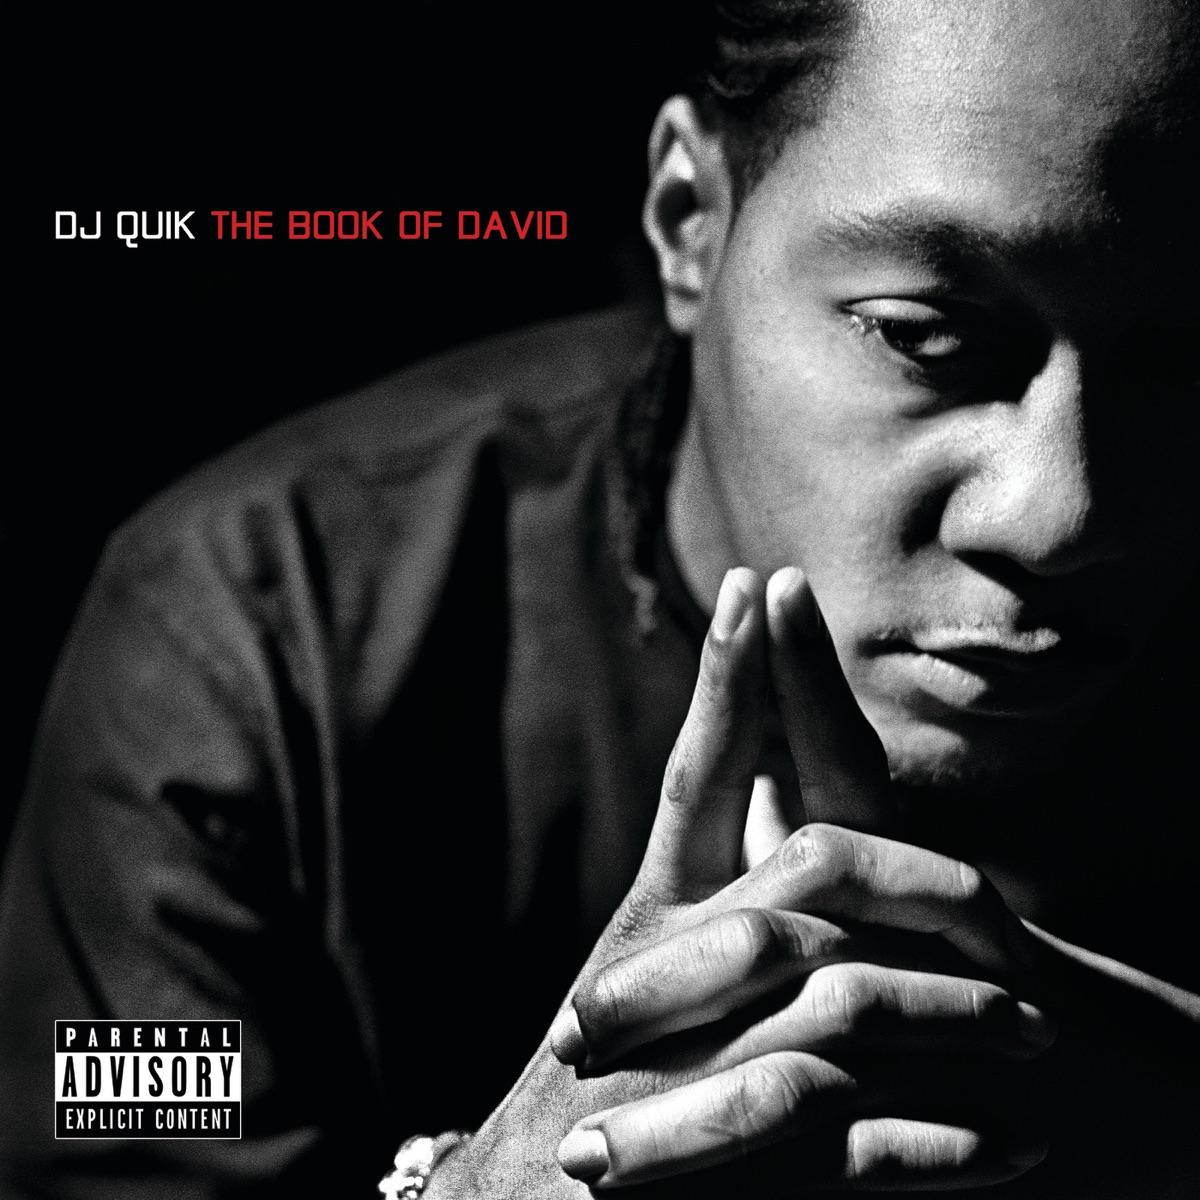 The Book of David DJ Quik CD cover